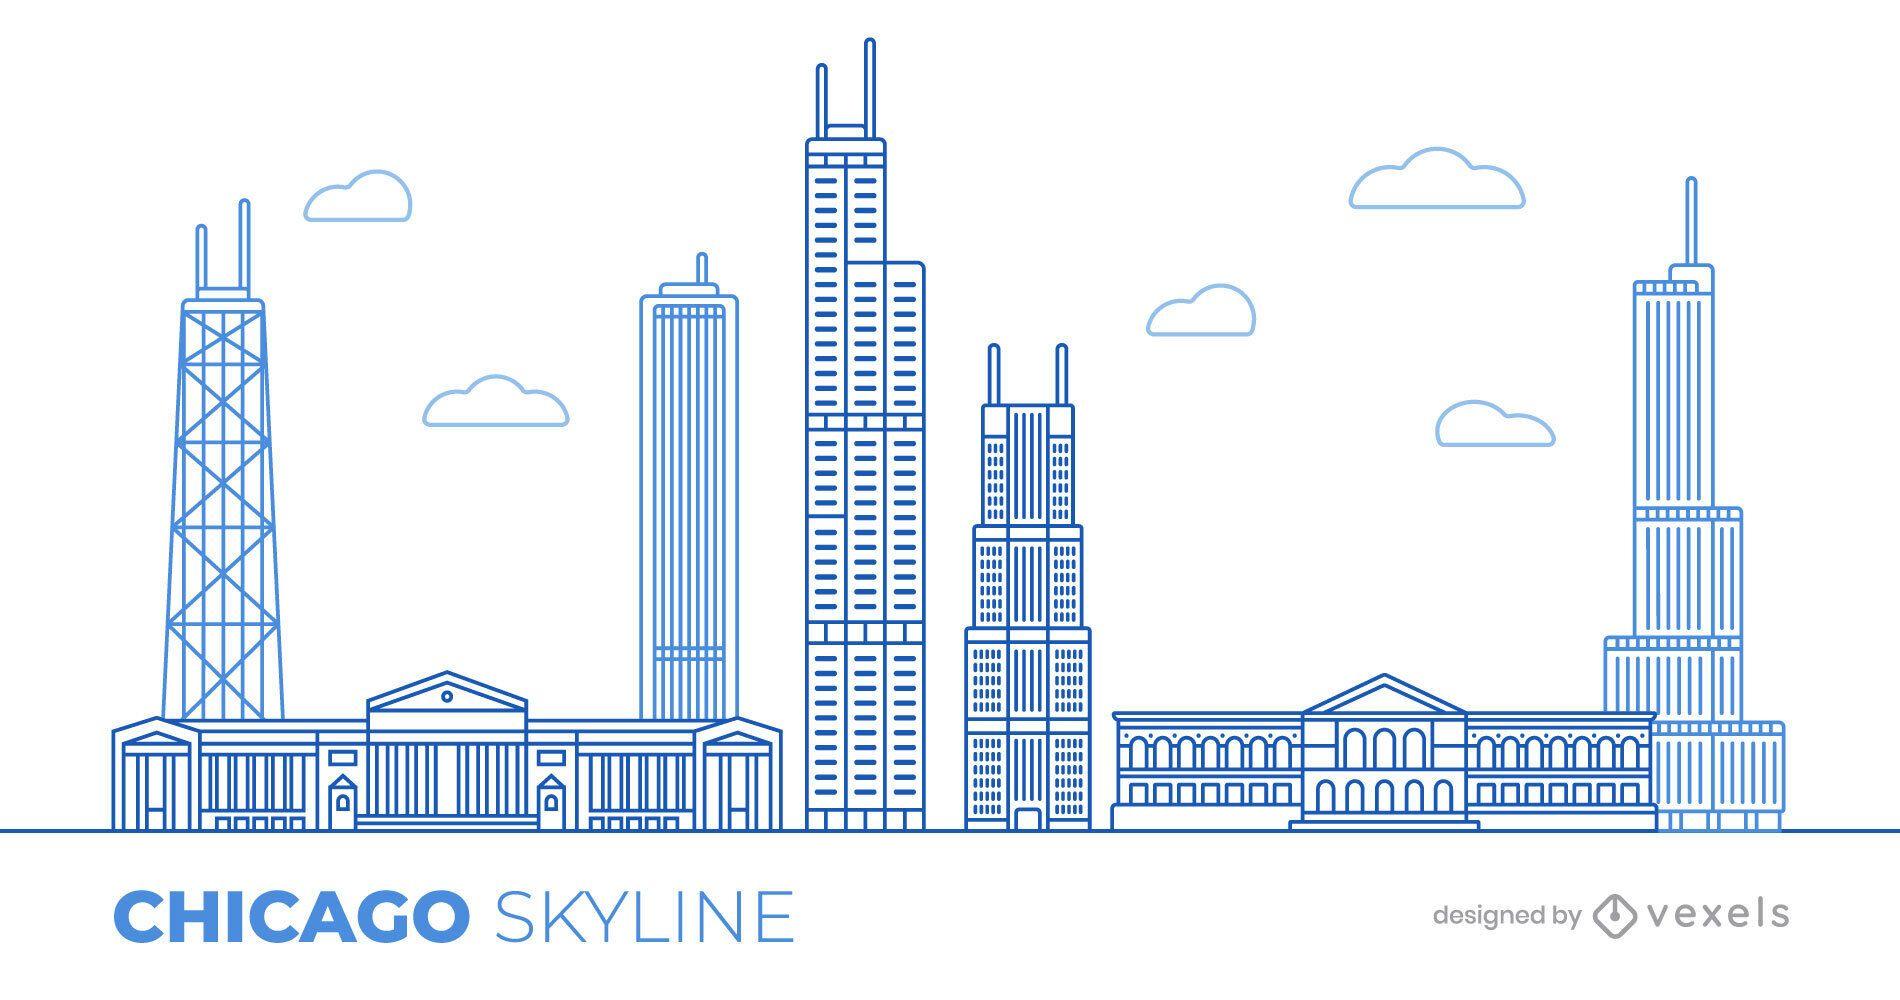 Chicago skyline illustration design